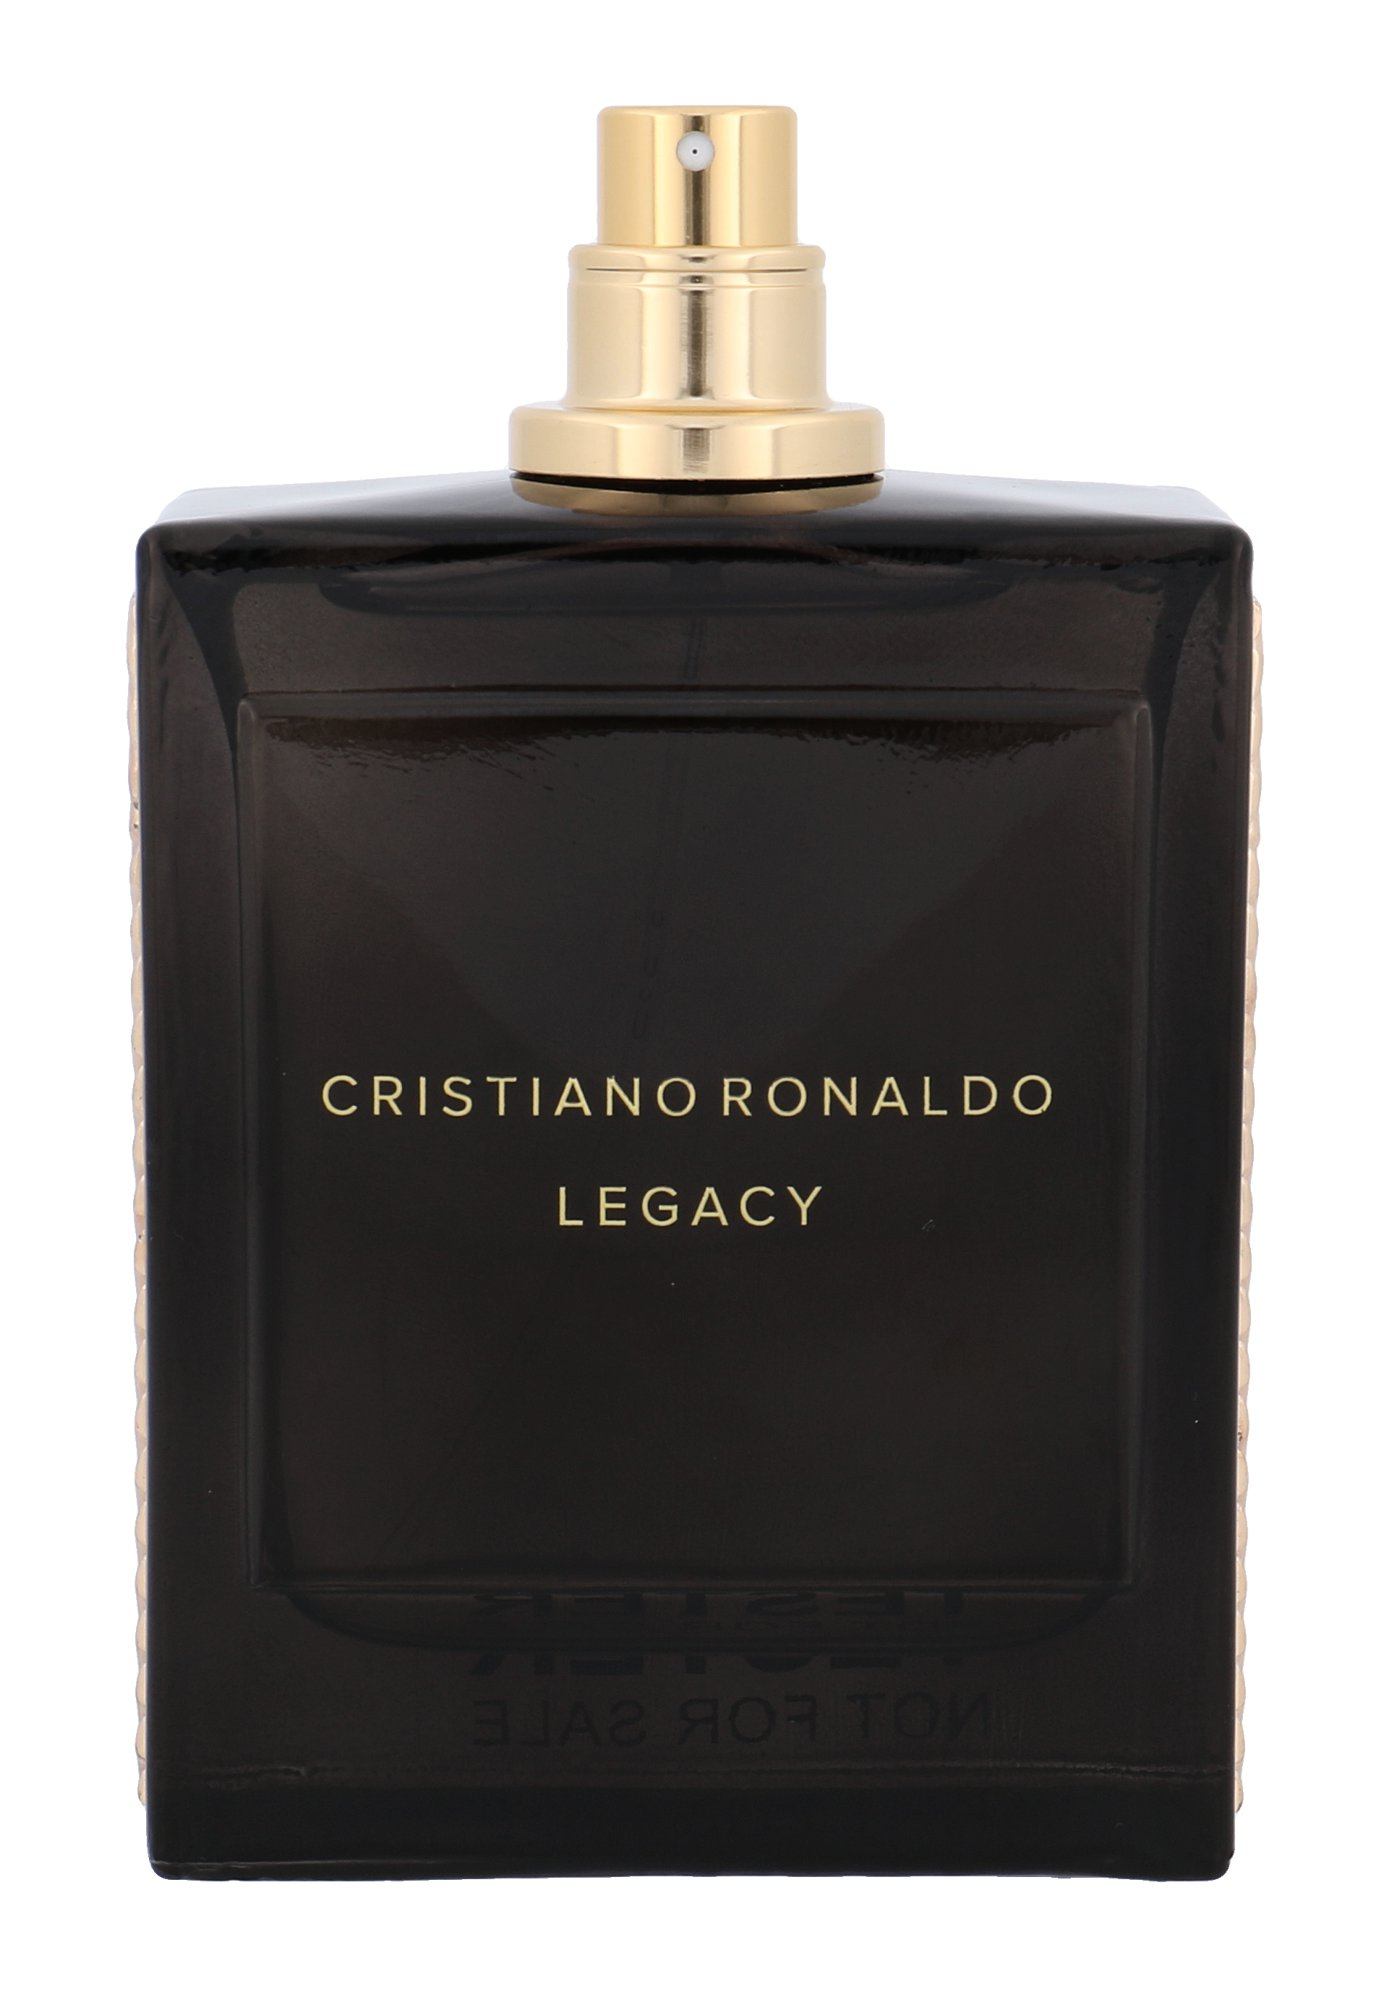 Cristiano Ronaldo Legacy (M)